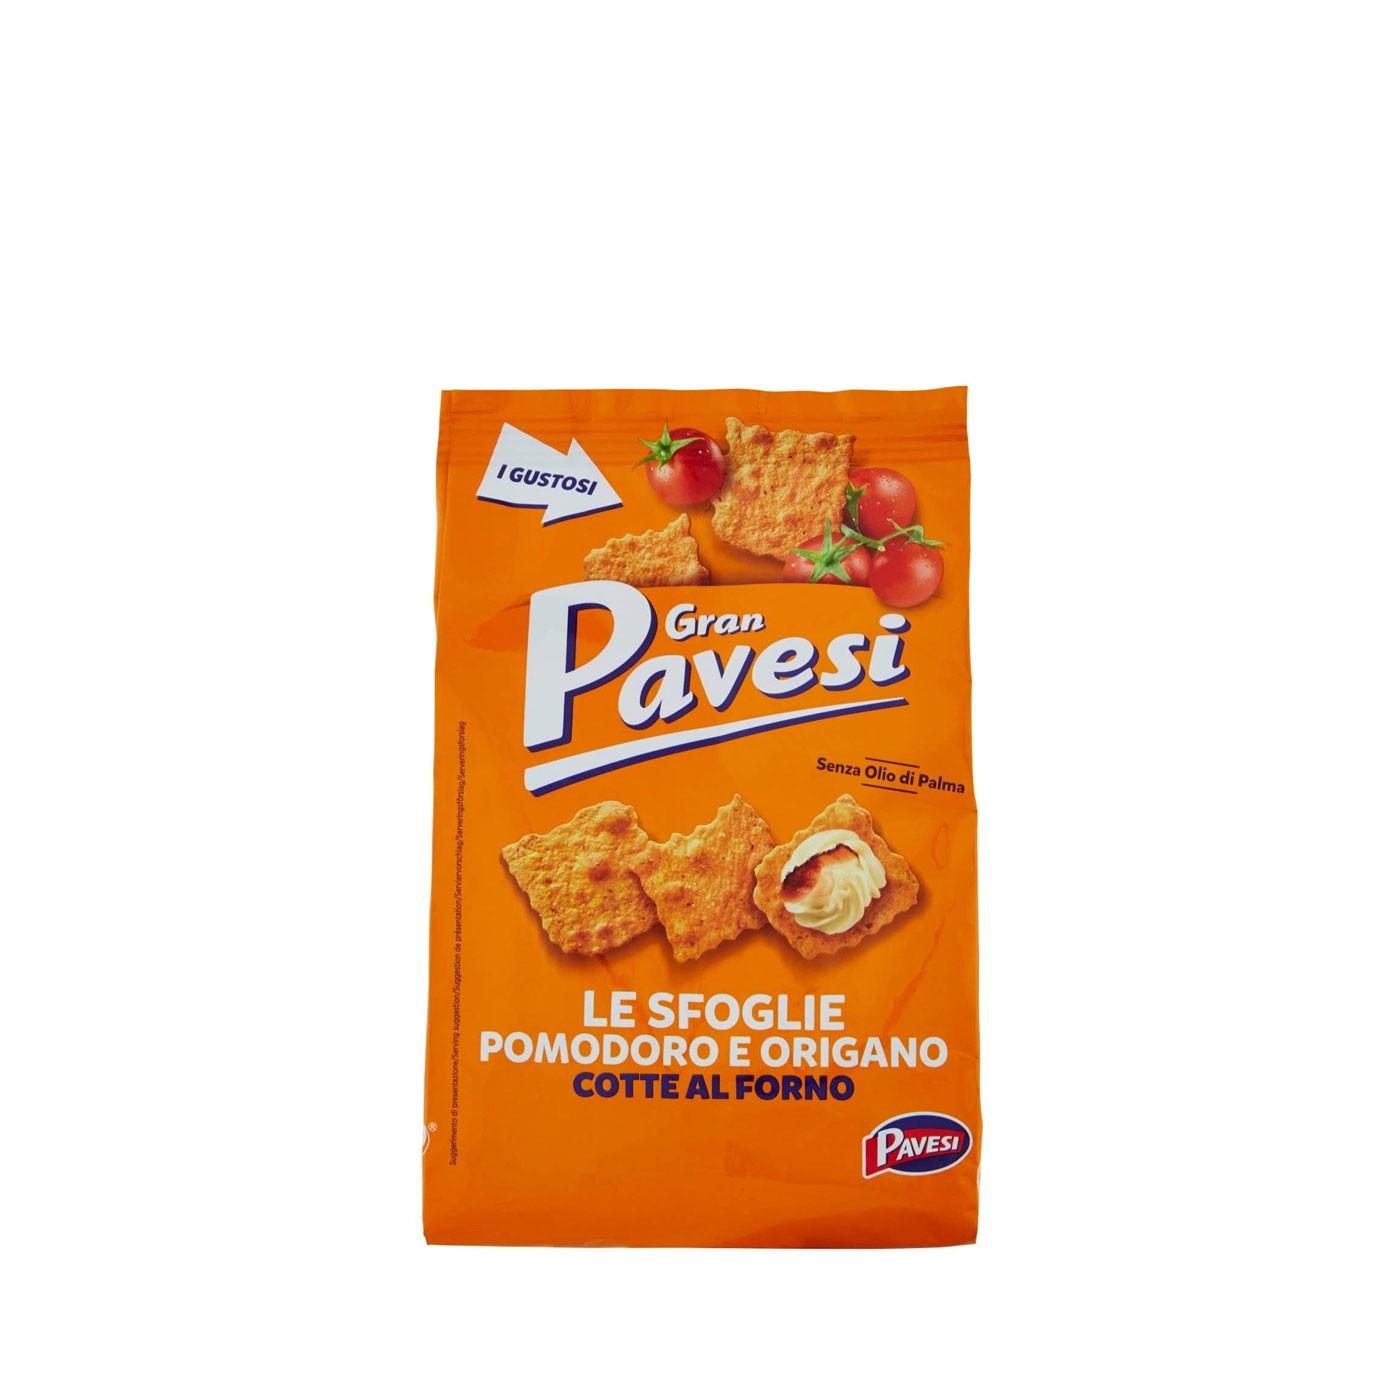 Gran Pavesi Le Sfoglie Tomato and Oregano Crackers 5.6 oz